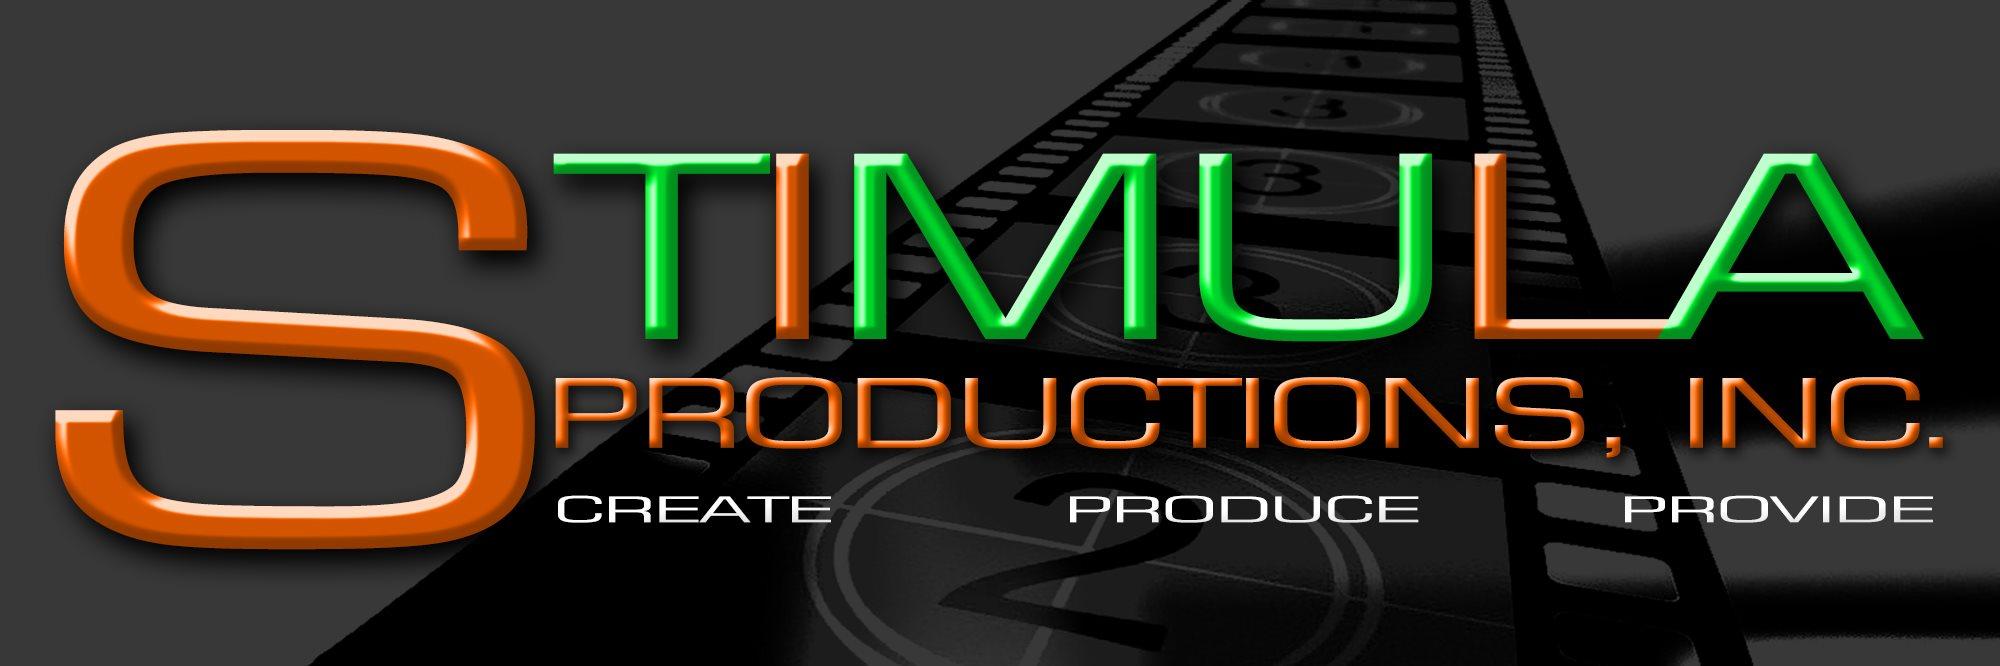 Stimula Productions Inc.